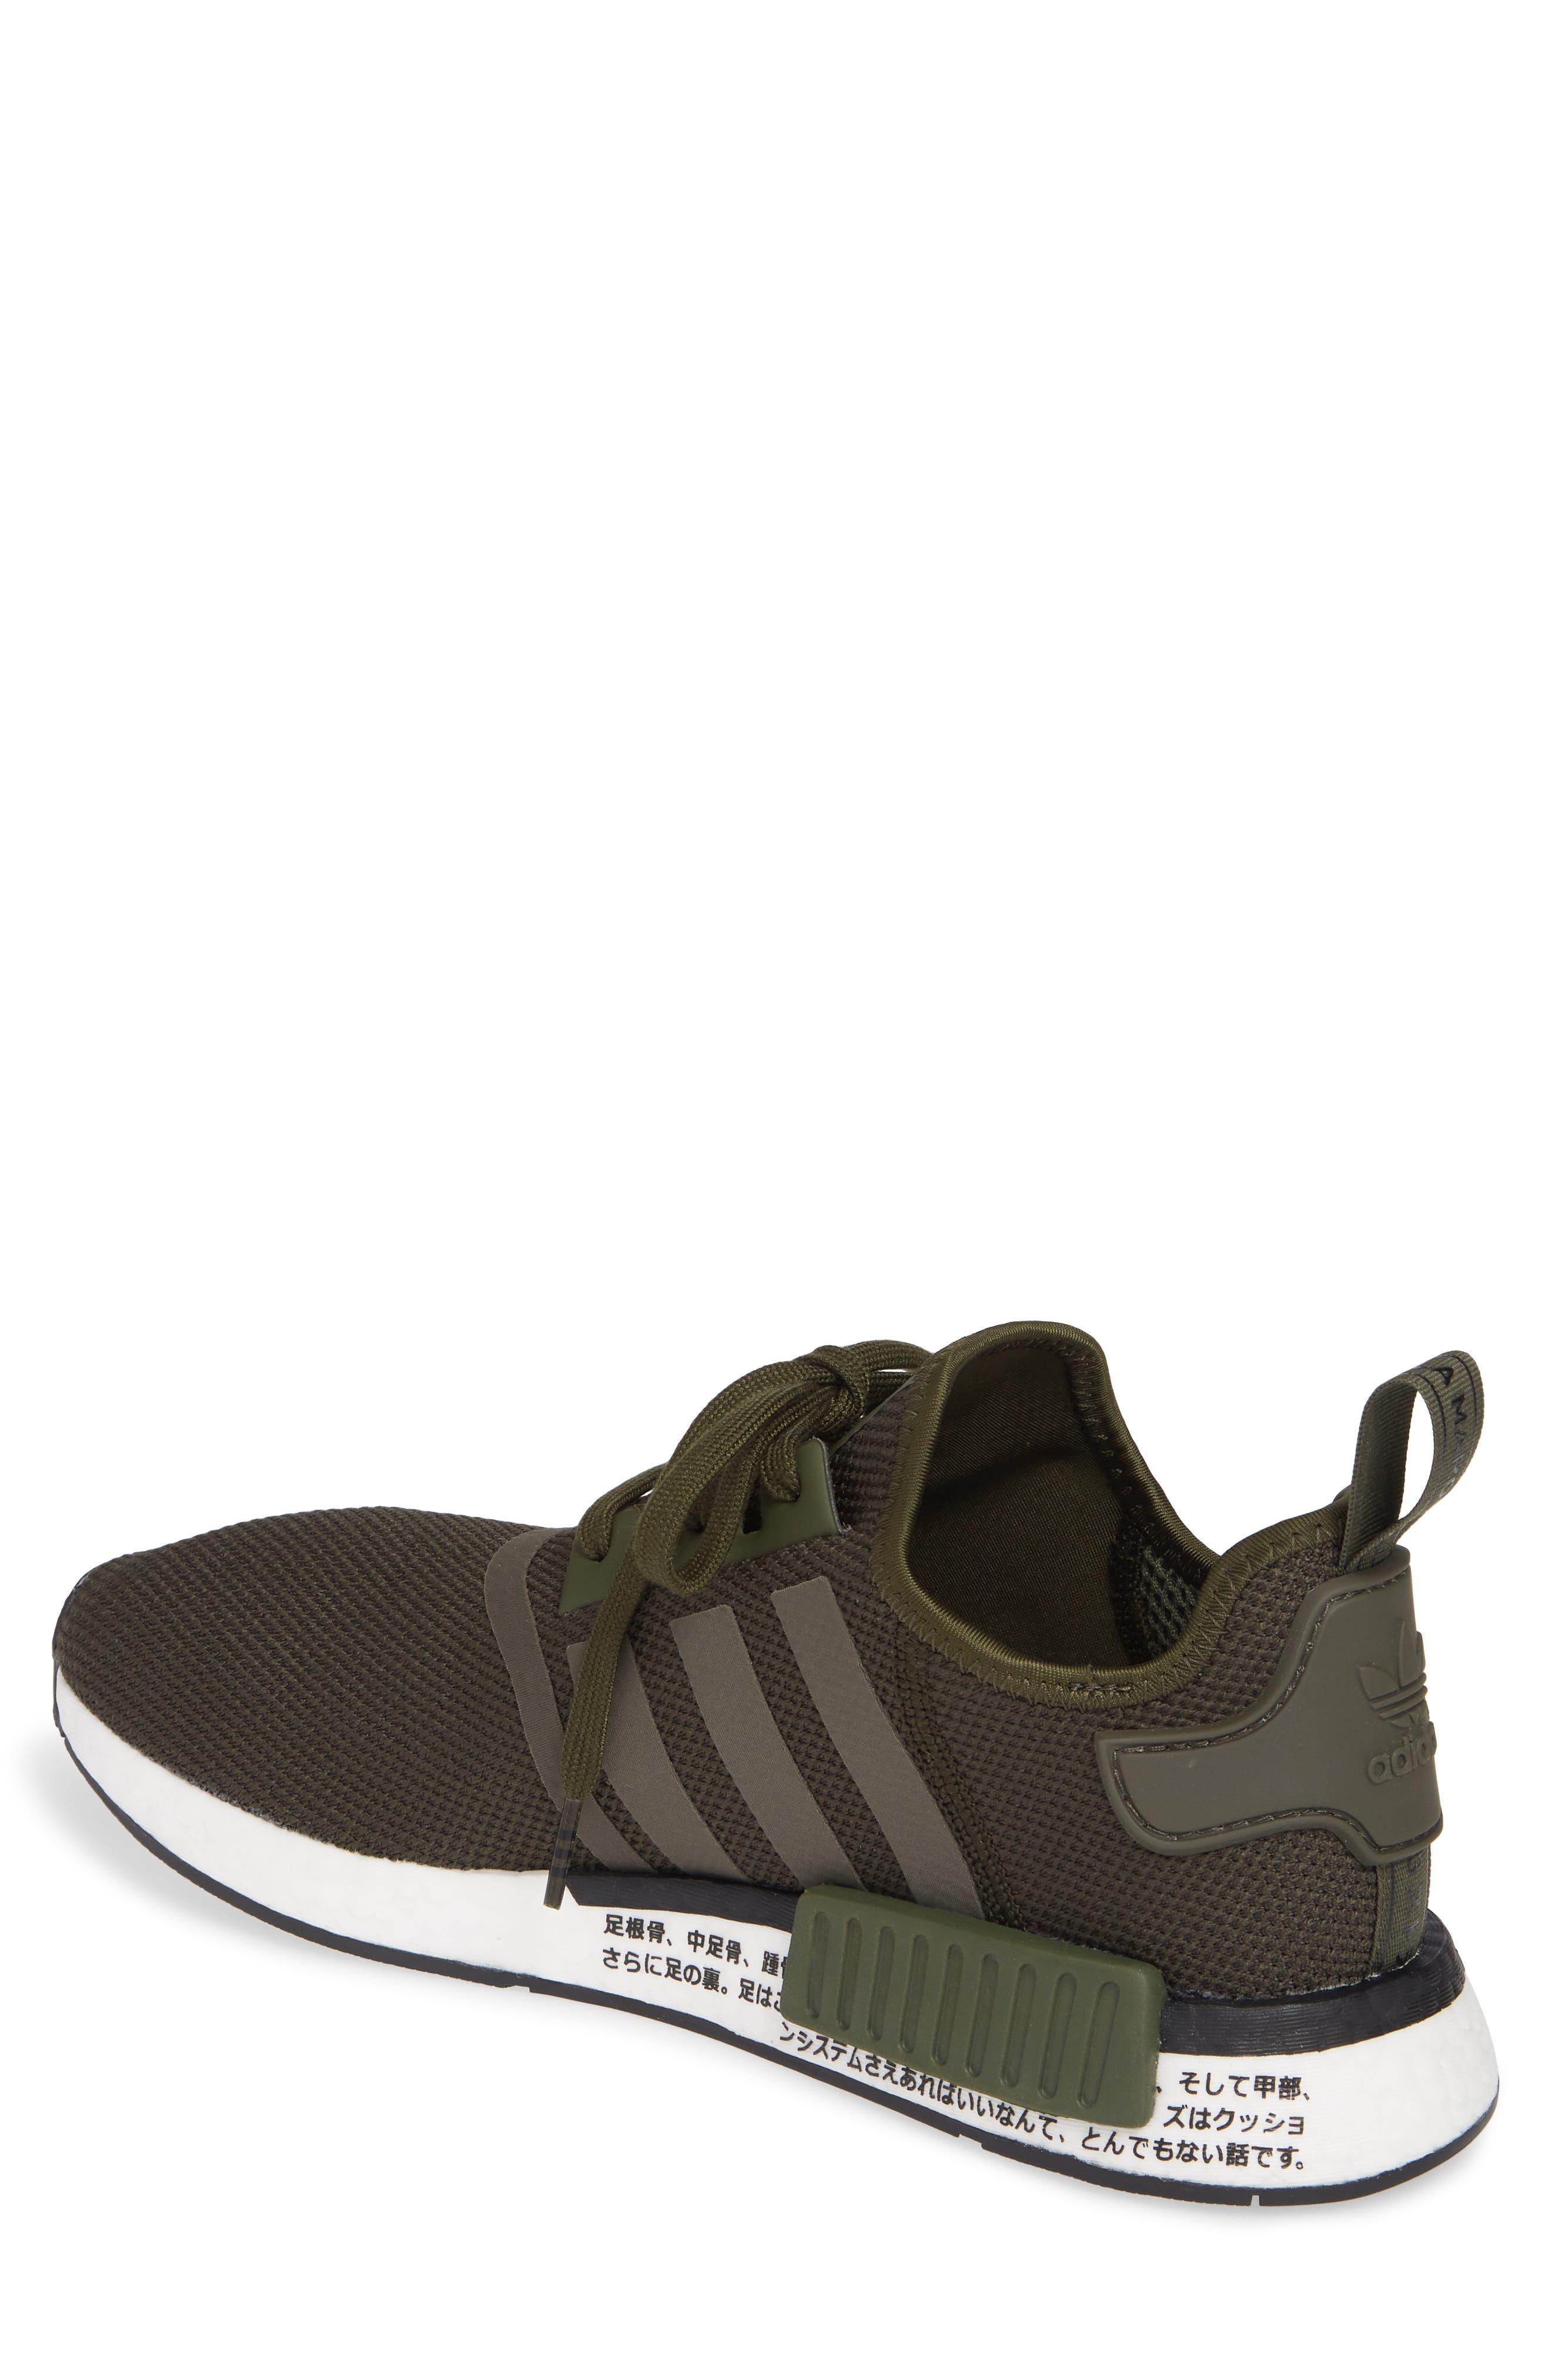 ADIDAS, Originals NMD R1 Sneaker, Alternate thumbnail 2, color, NIGHT CARGO/ BLACK